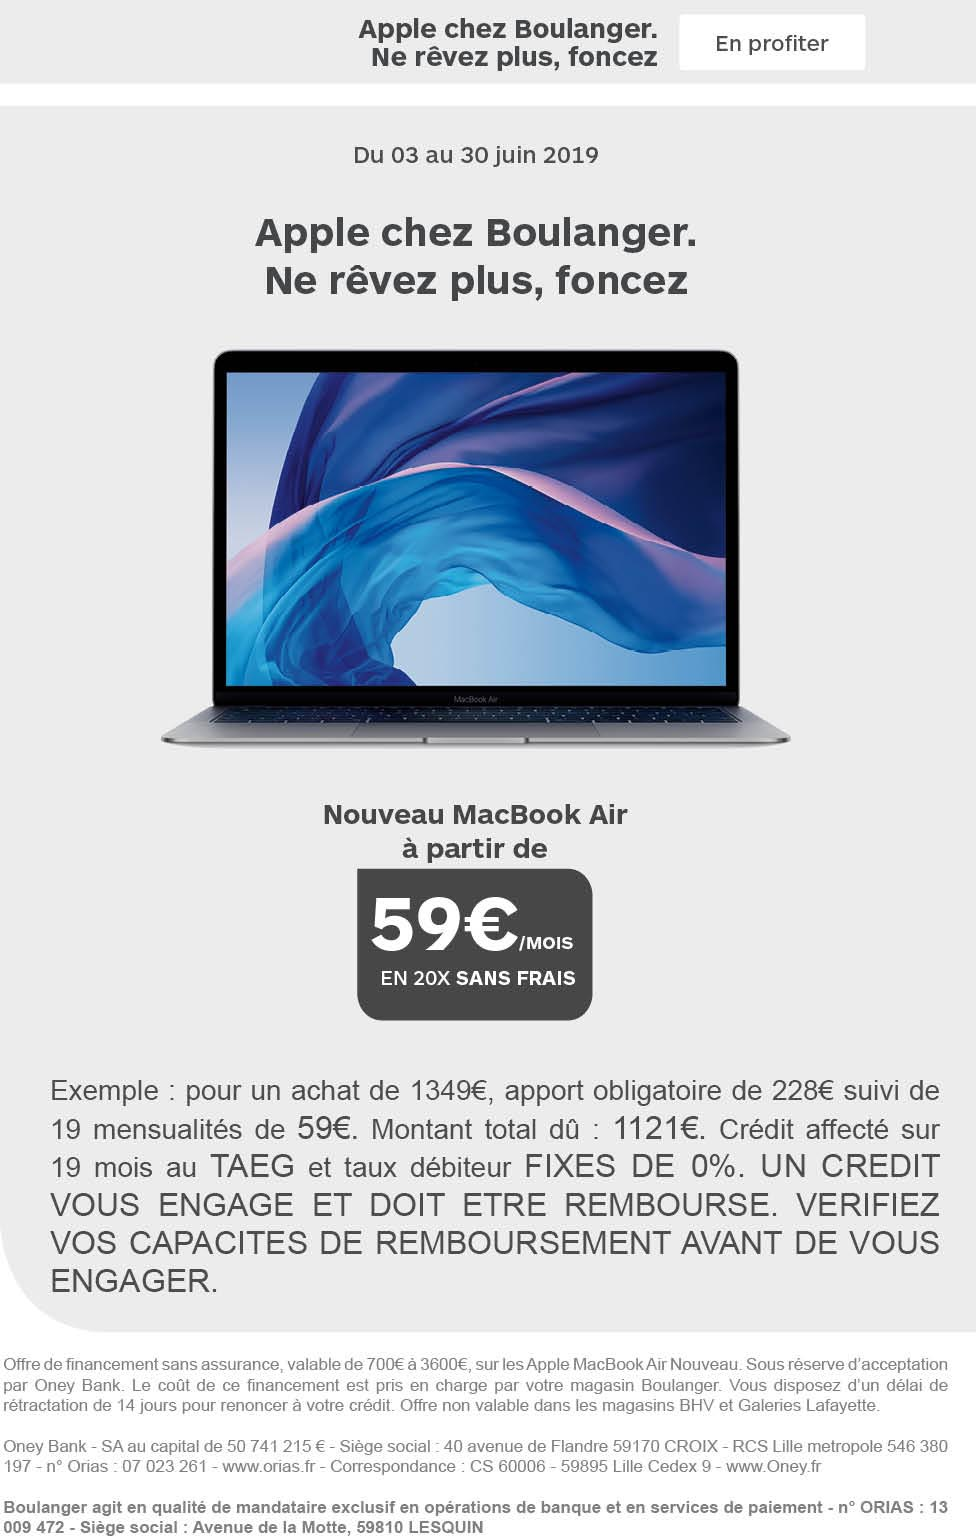 MacBook Air 20 fois sans frais Boulanger